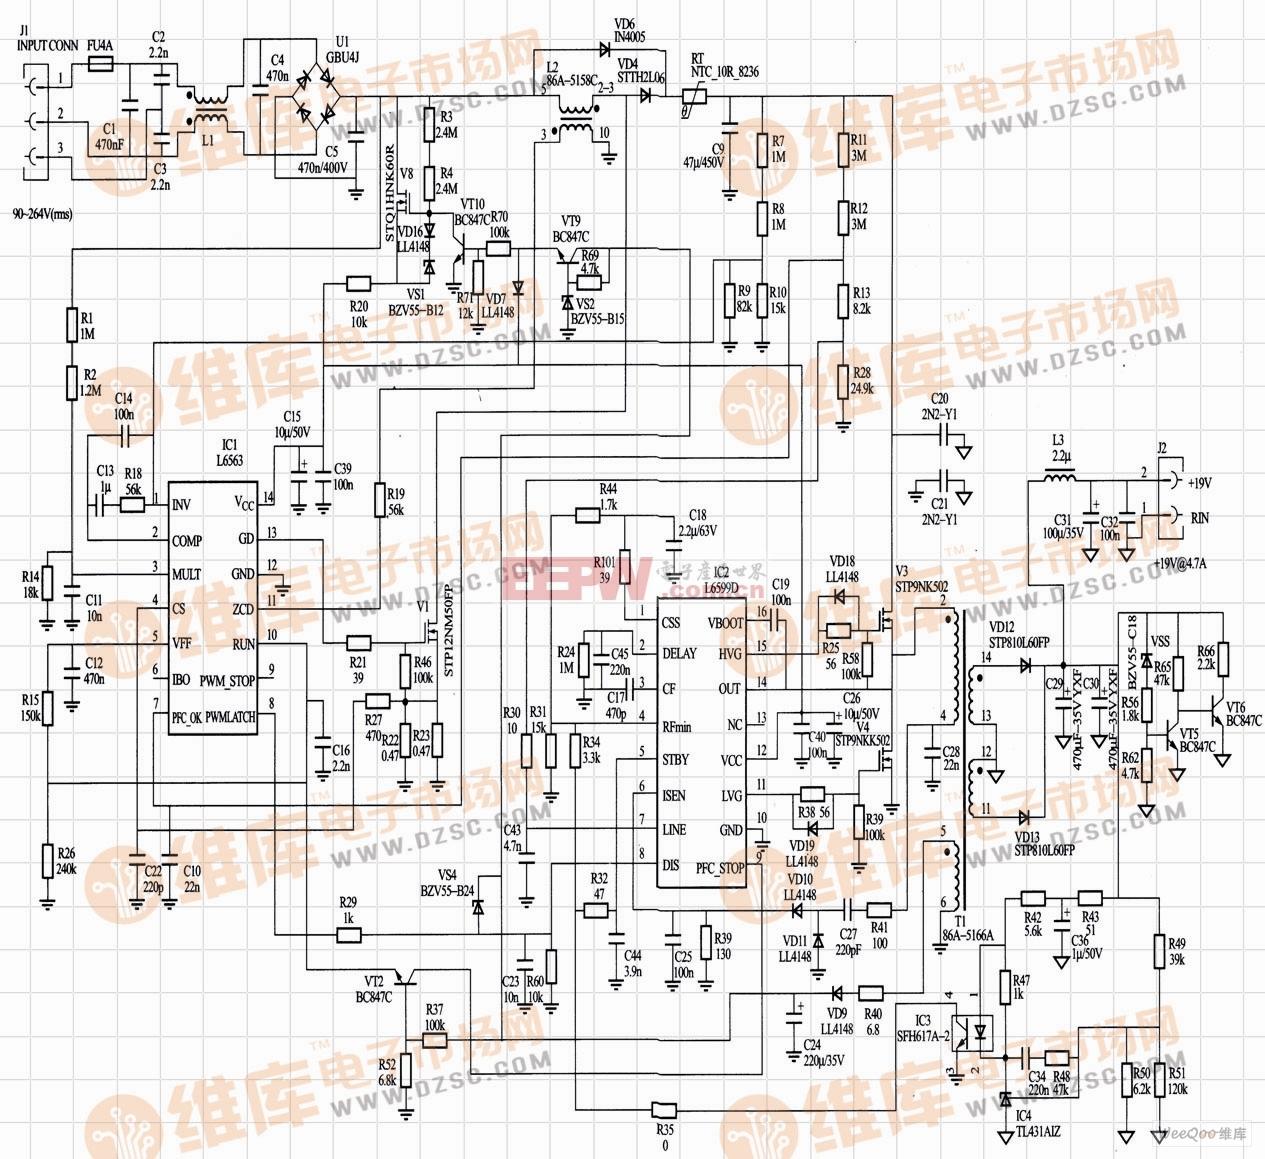 L6563和L6599组成的90W AC/DC适配器的完整电路